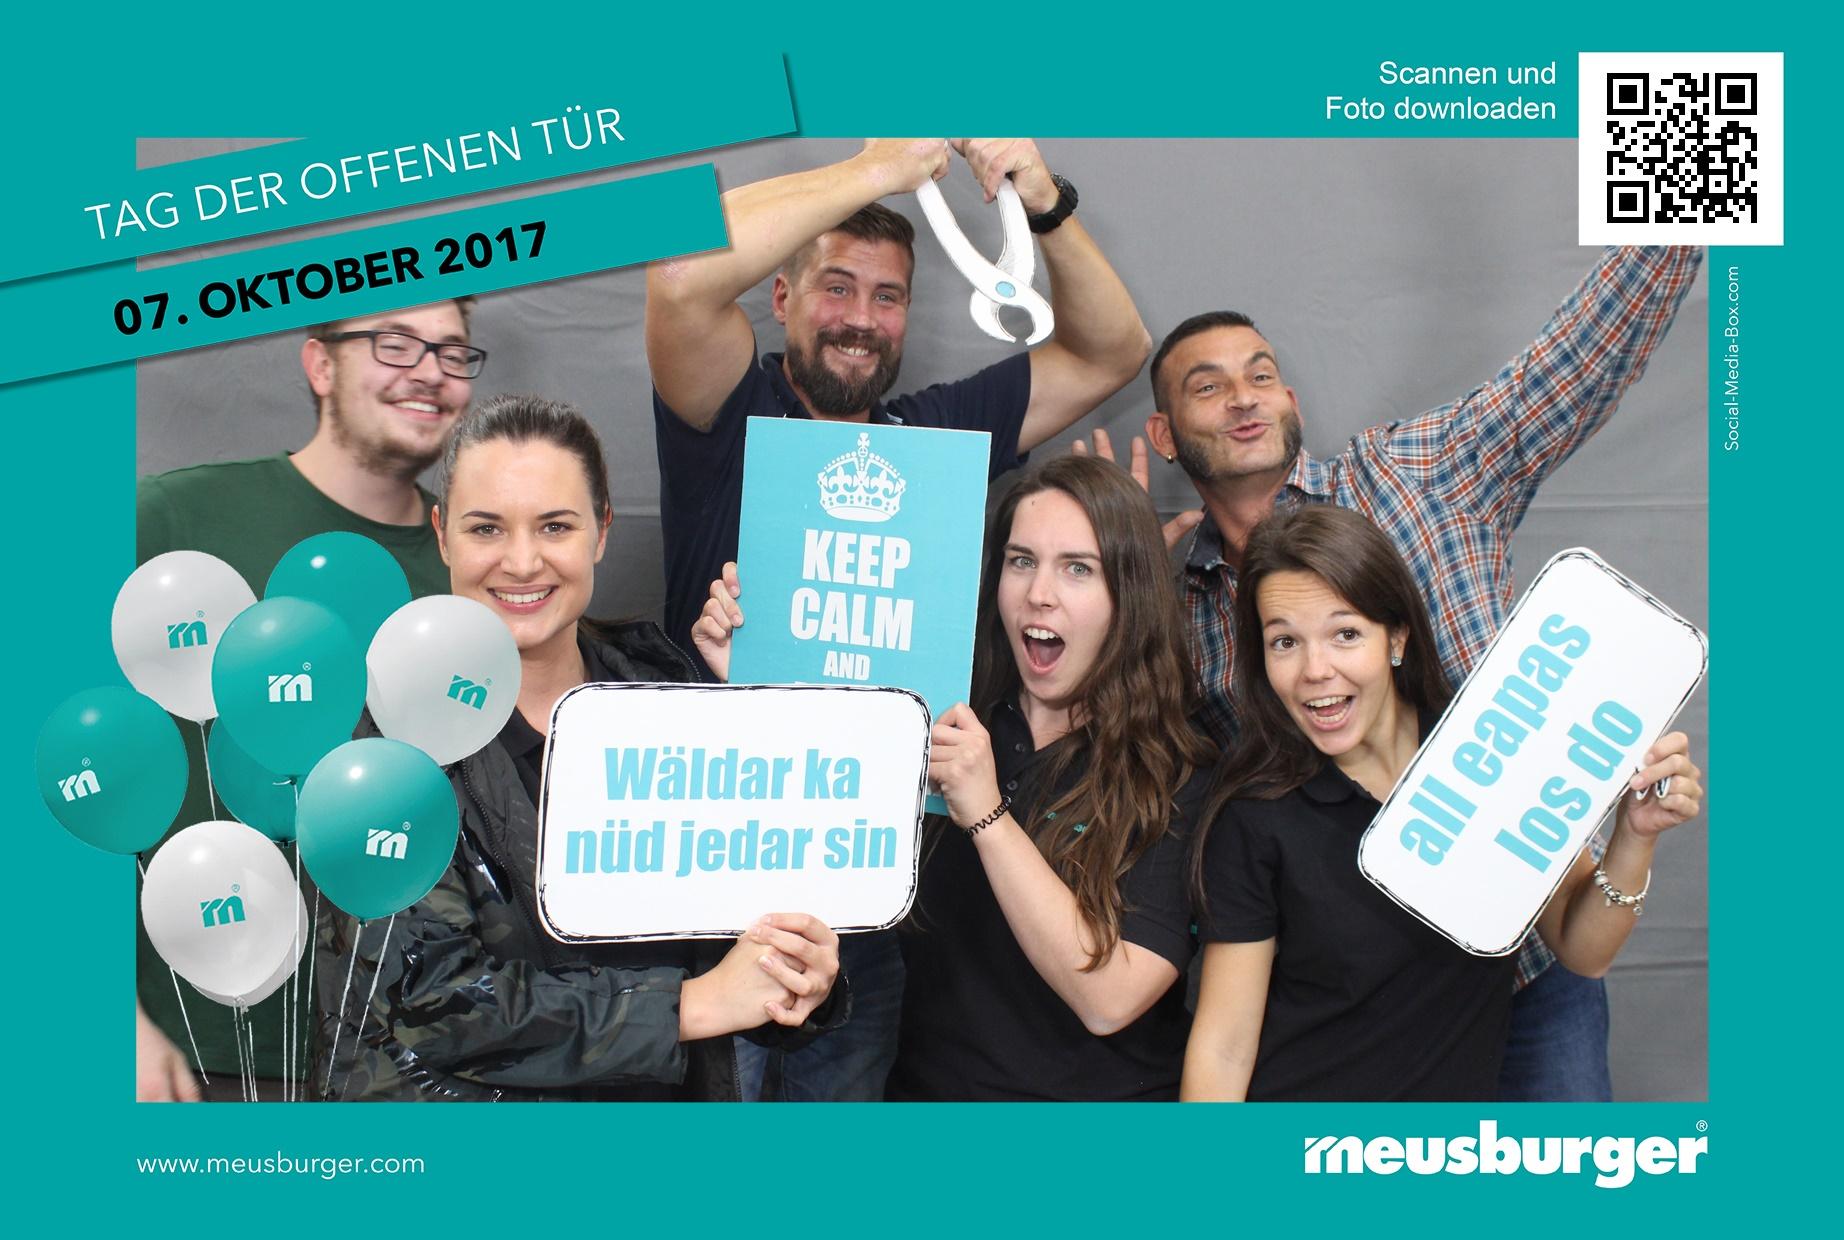 Meusburger_TagderoffenenTuer2017_Social-Media-Box_Print2